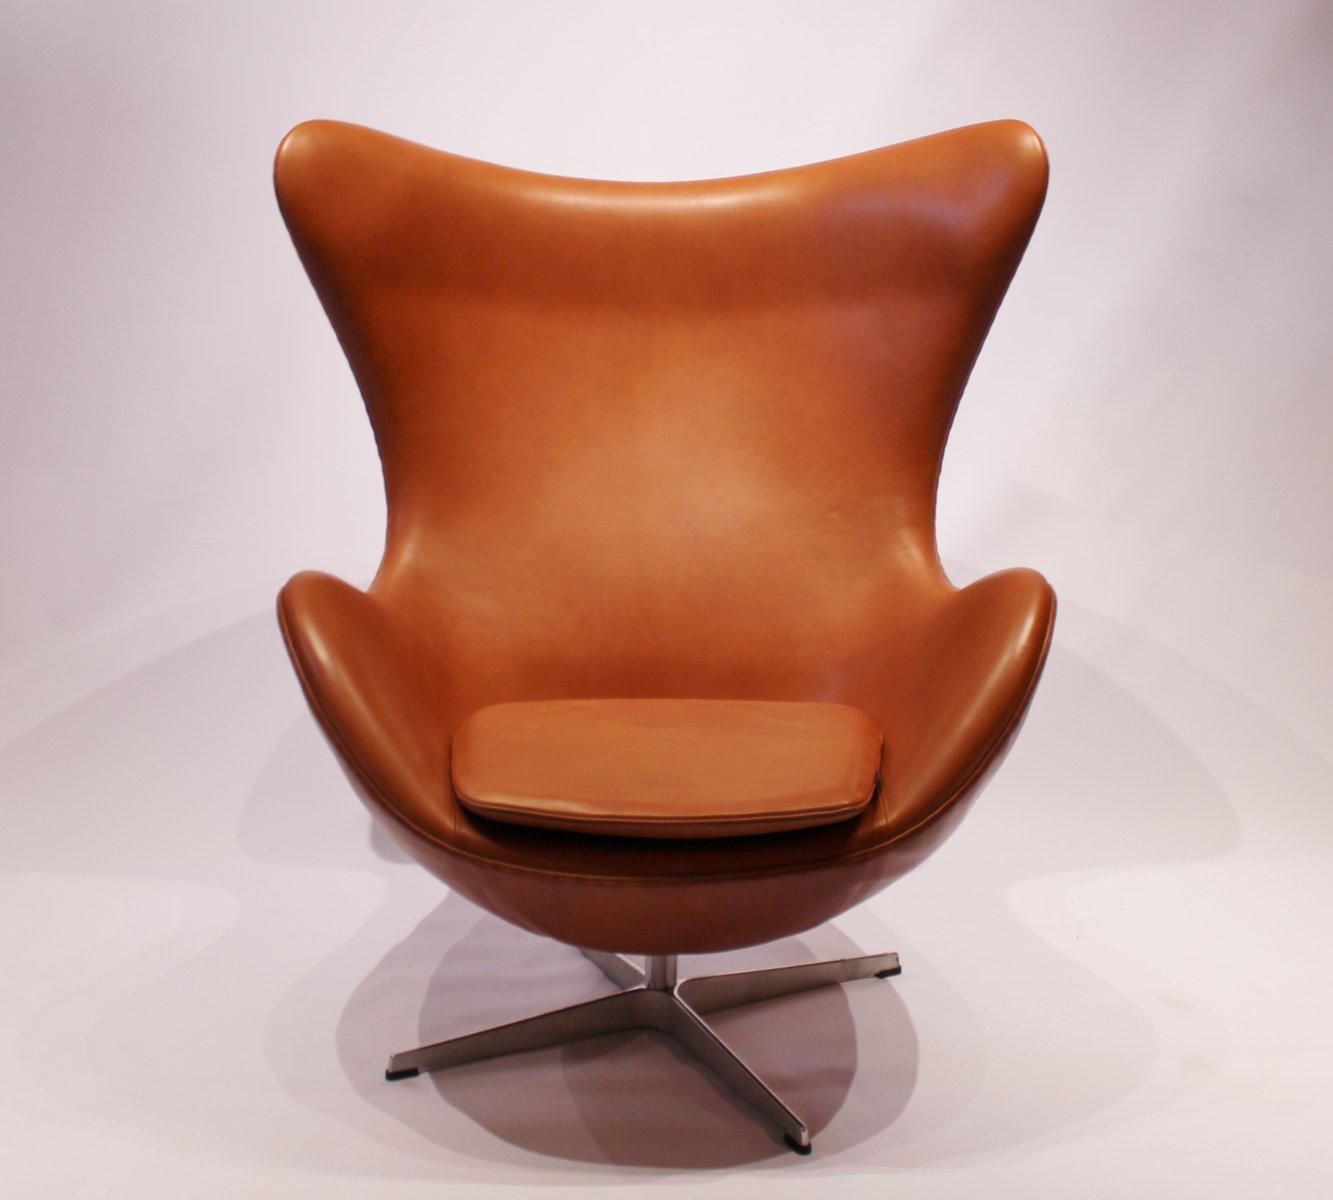 Model 3316 Egg Chair By Arne Jacobsen For Fritz Hansen 1958 For Sale At Pamono